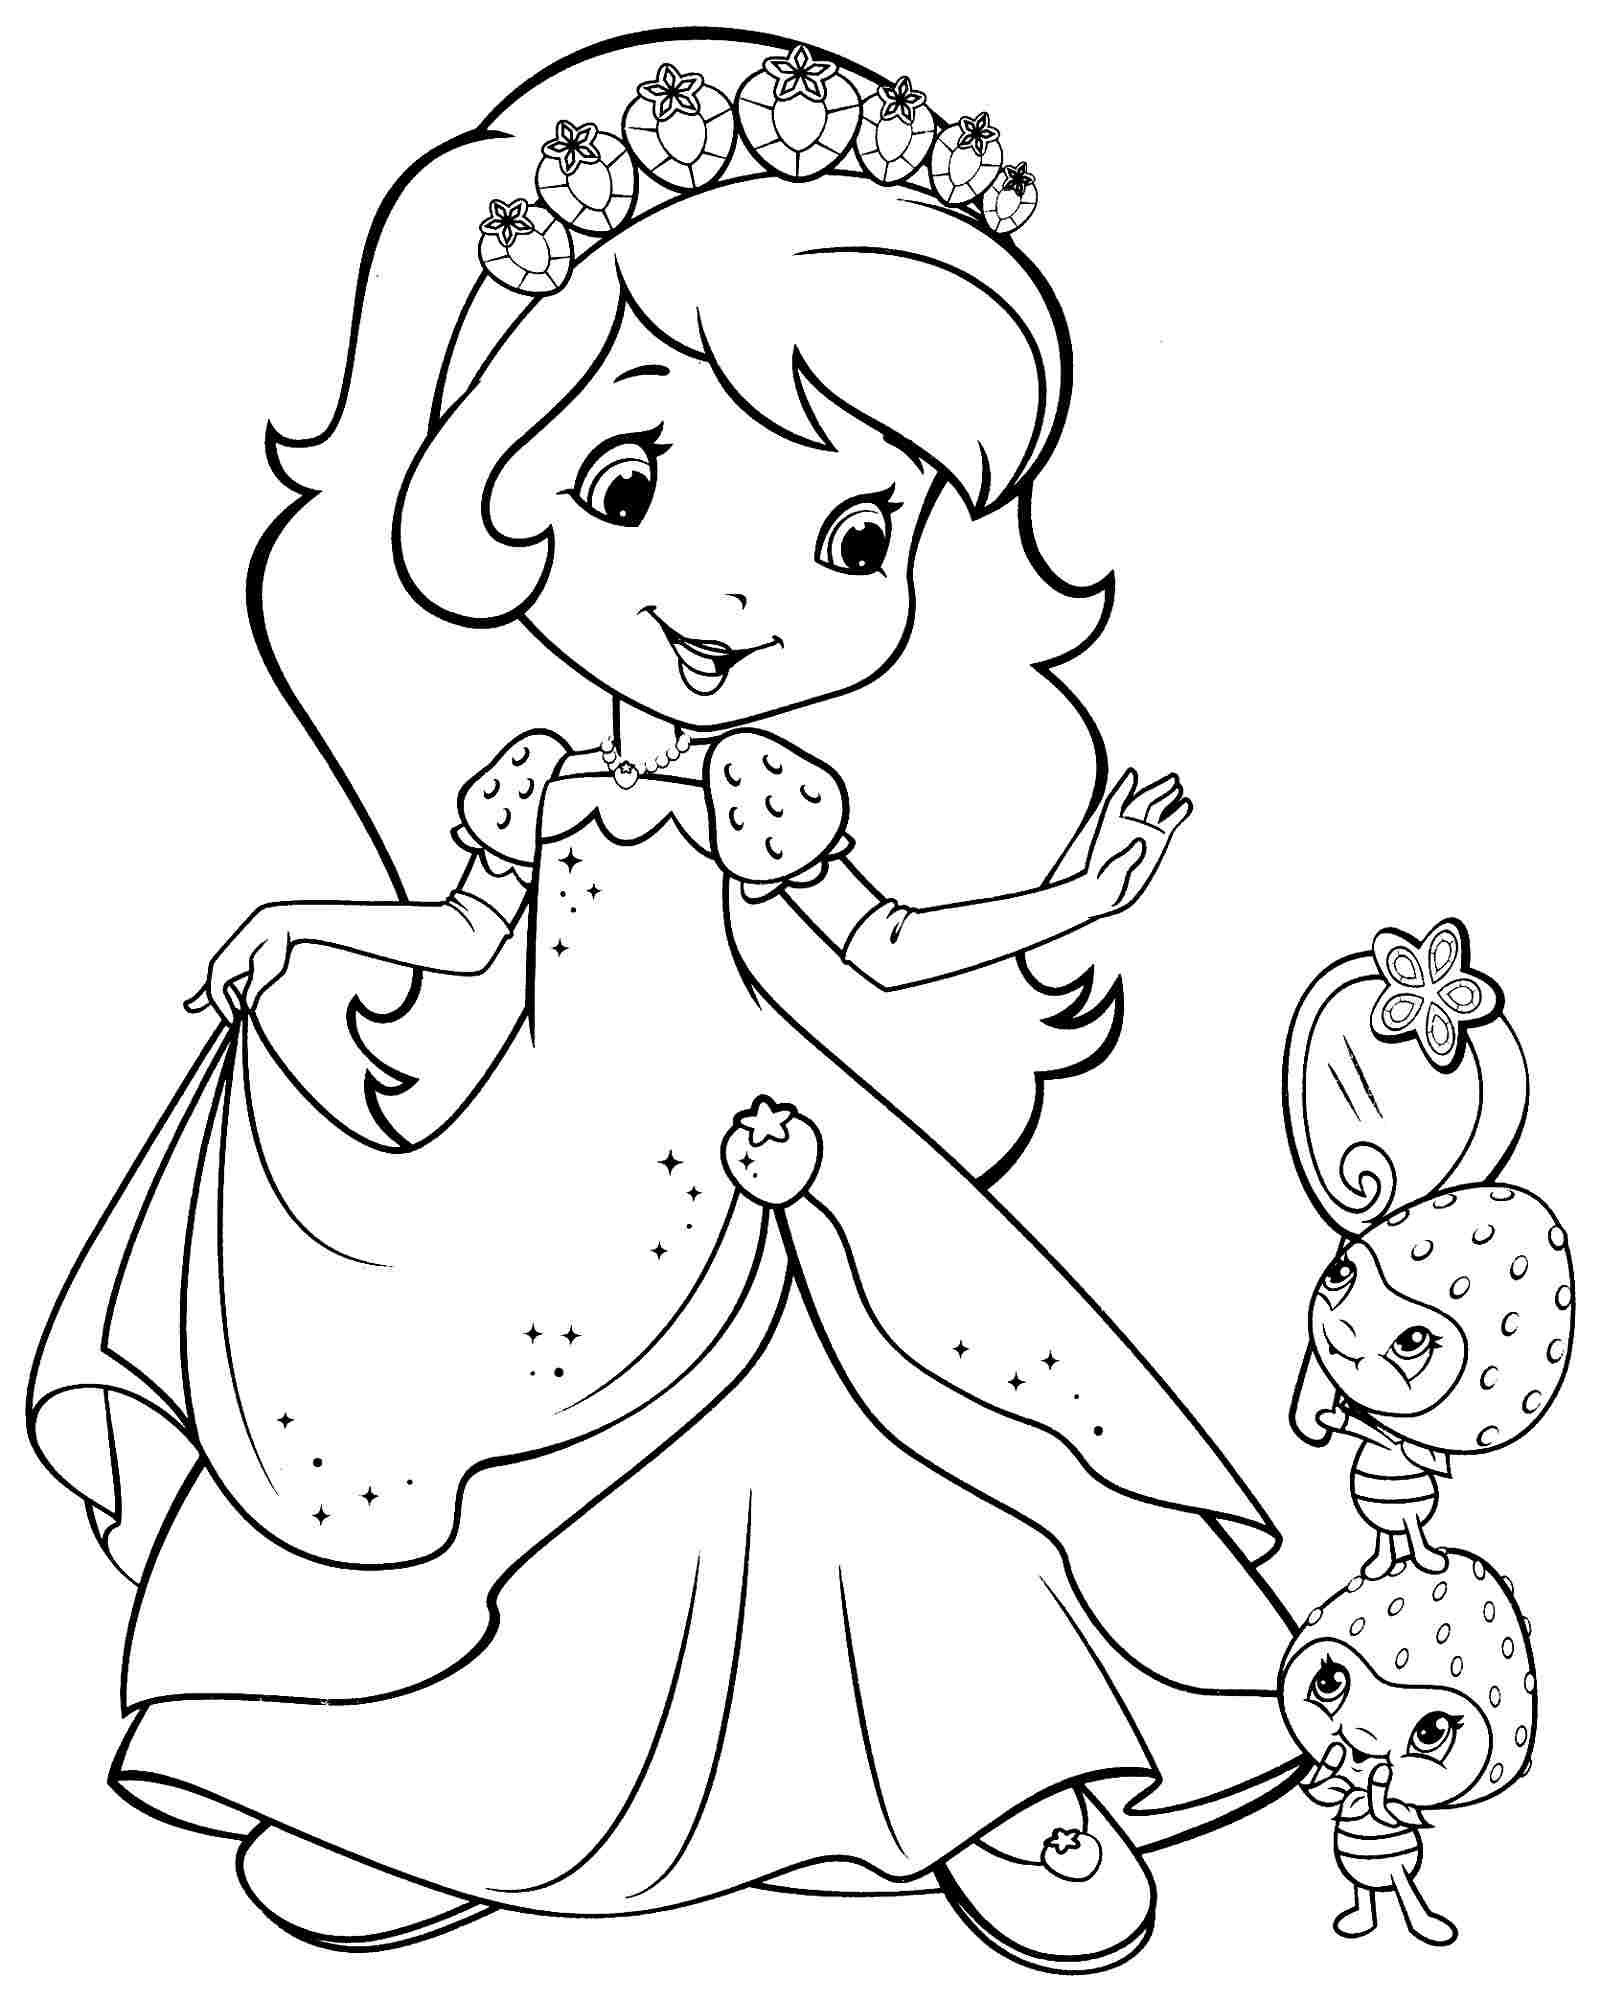 Strawberry Shortcake Cartoon Coloring Pages Free Cartoon Strawberry Shortcake For Kids Colouring Pages Prin Libros Para Colorear Dibujos Frozen Para Colorear